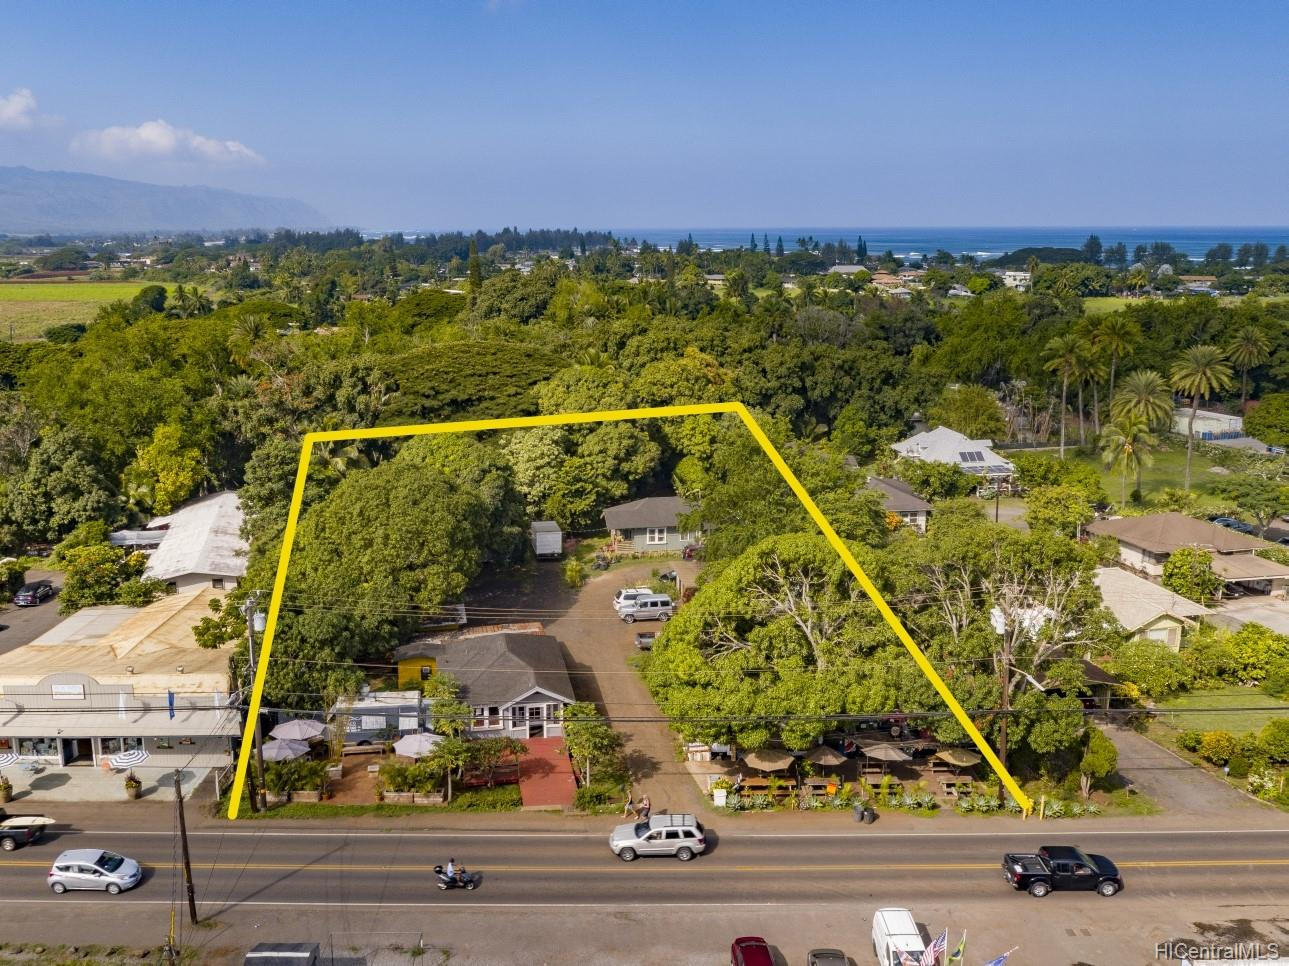 66-239 Kamehameha Hwy Haleiwa Oahu commercial real estate photo1 of 7